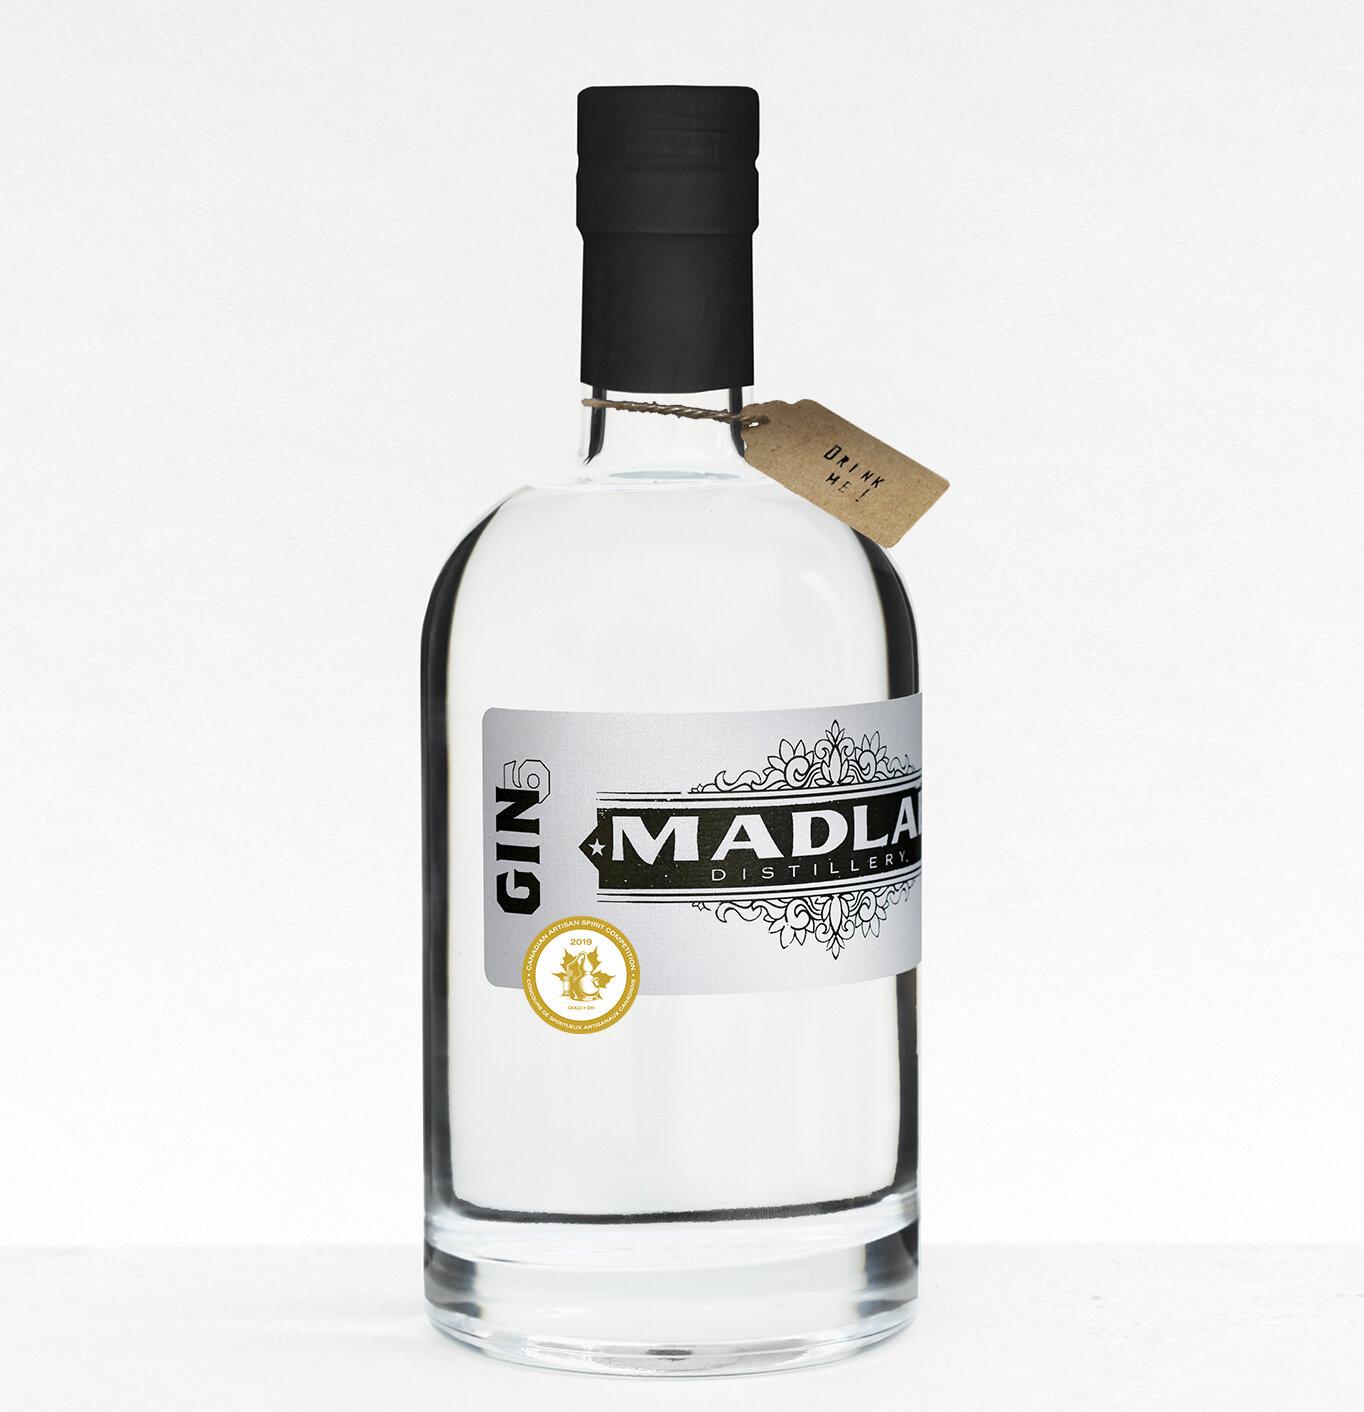 Image courtesy of Mad Laboratory Distilling